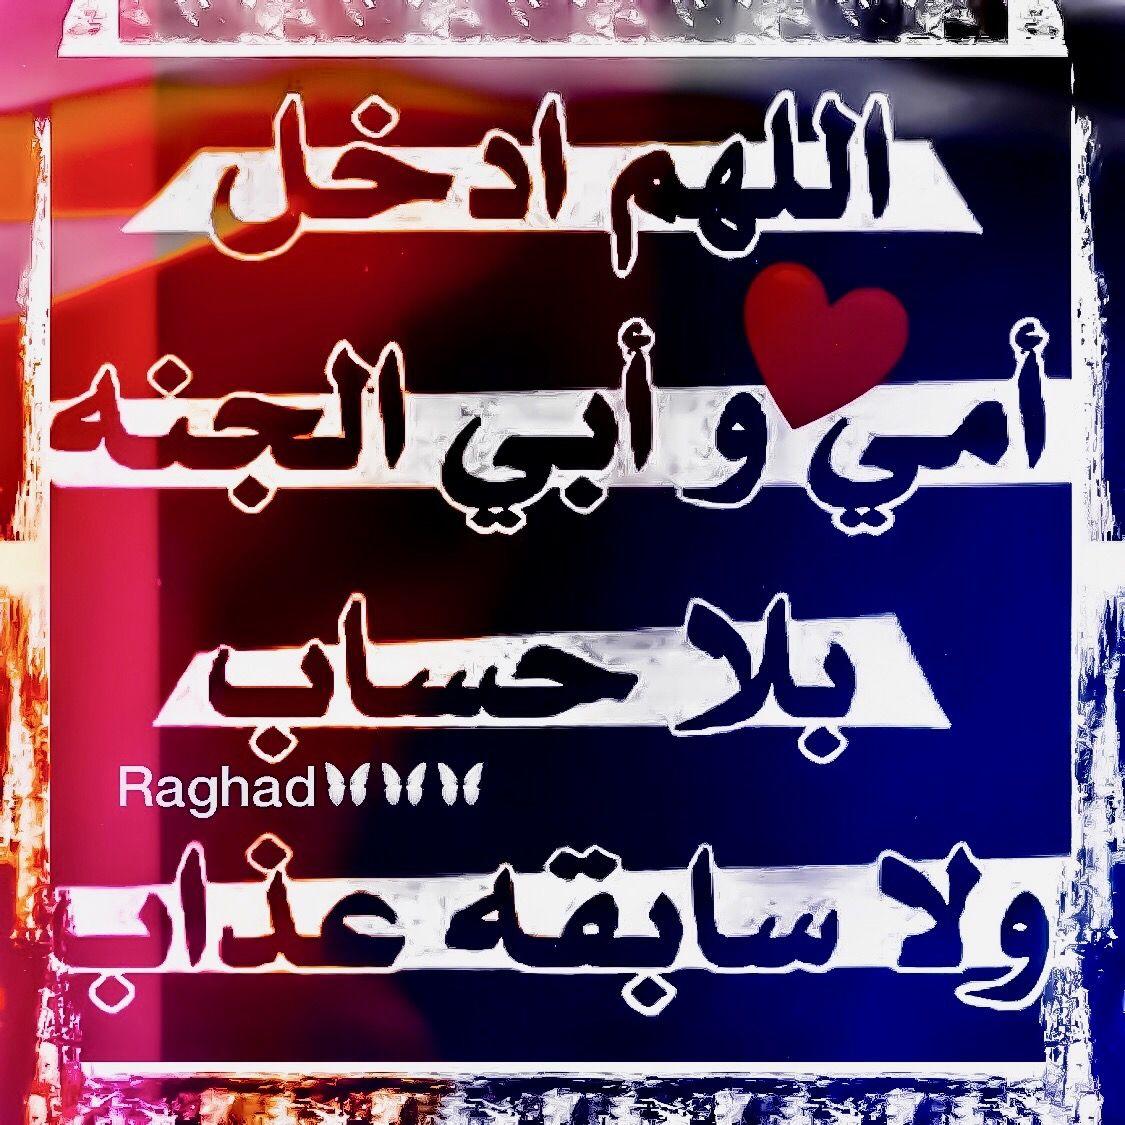 Desertrose اللهم إني أستودعك ديني وأمانتي وذريتي وزوجي وقلبي وقلب ذريتي وقلب زوجي وسمعهم وأبصارهم وجميع جوارحهم Arabic Calligraphy Calligraphy